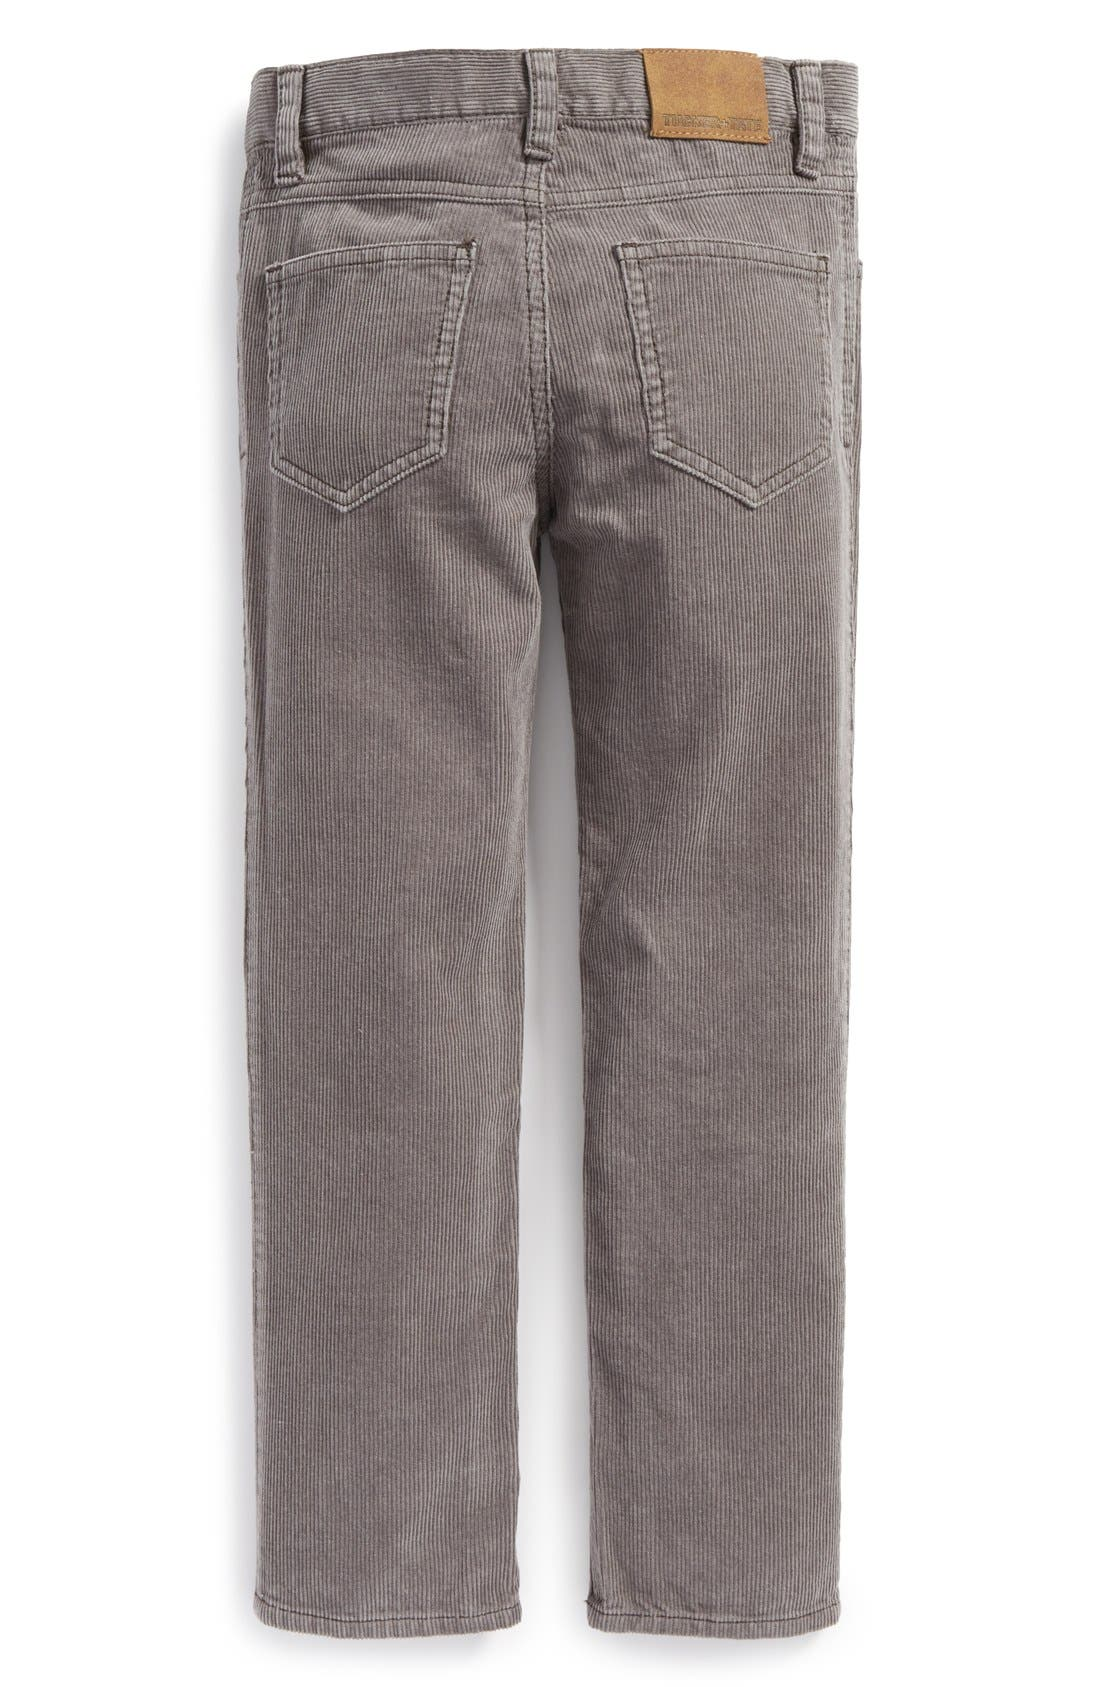 'Townsend' Corduroy Pants,                             Alternate thumbnail 10, color,